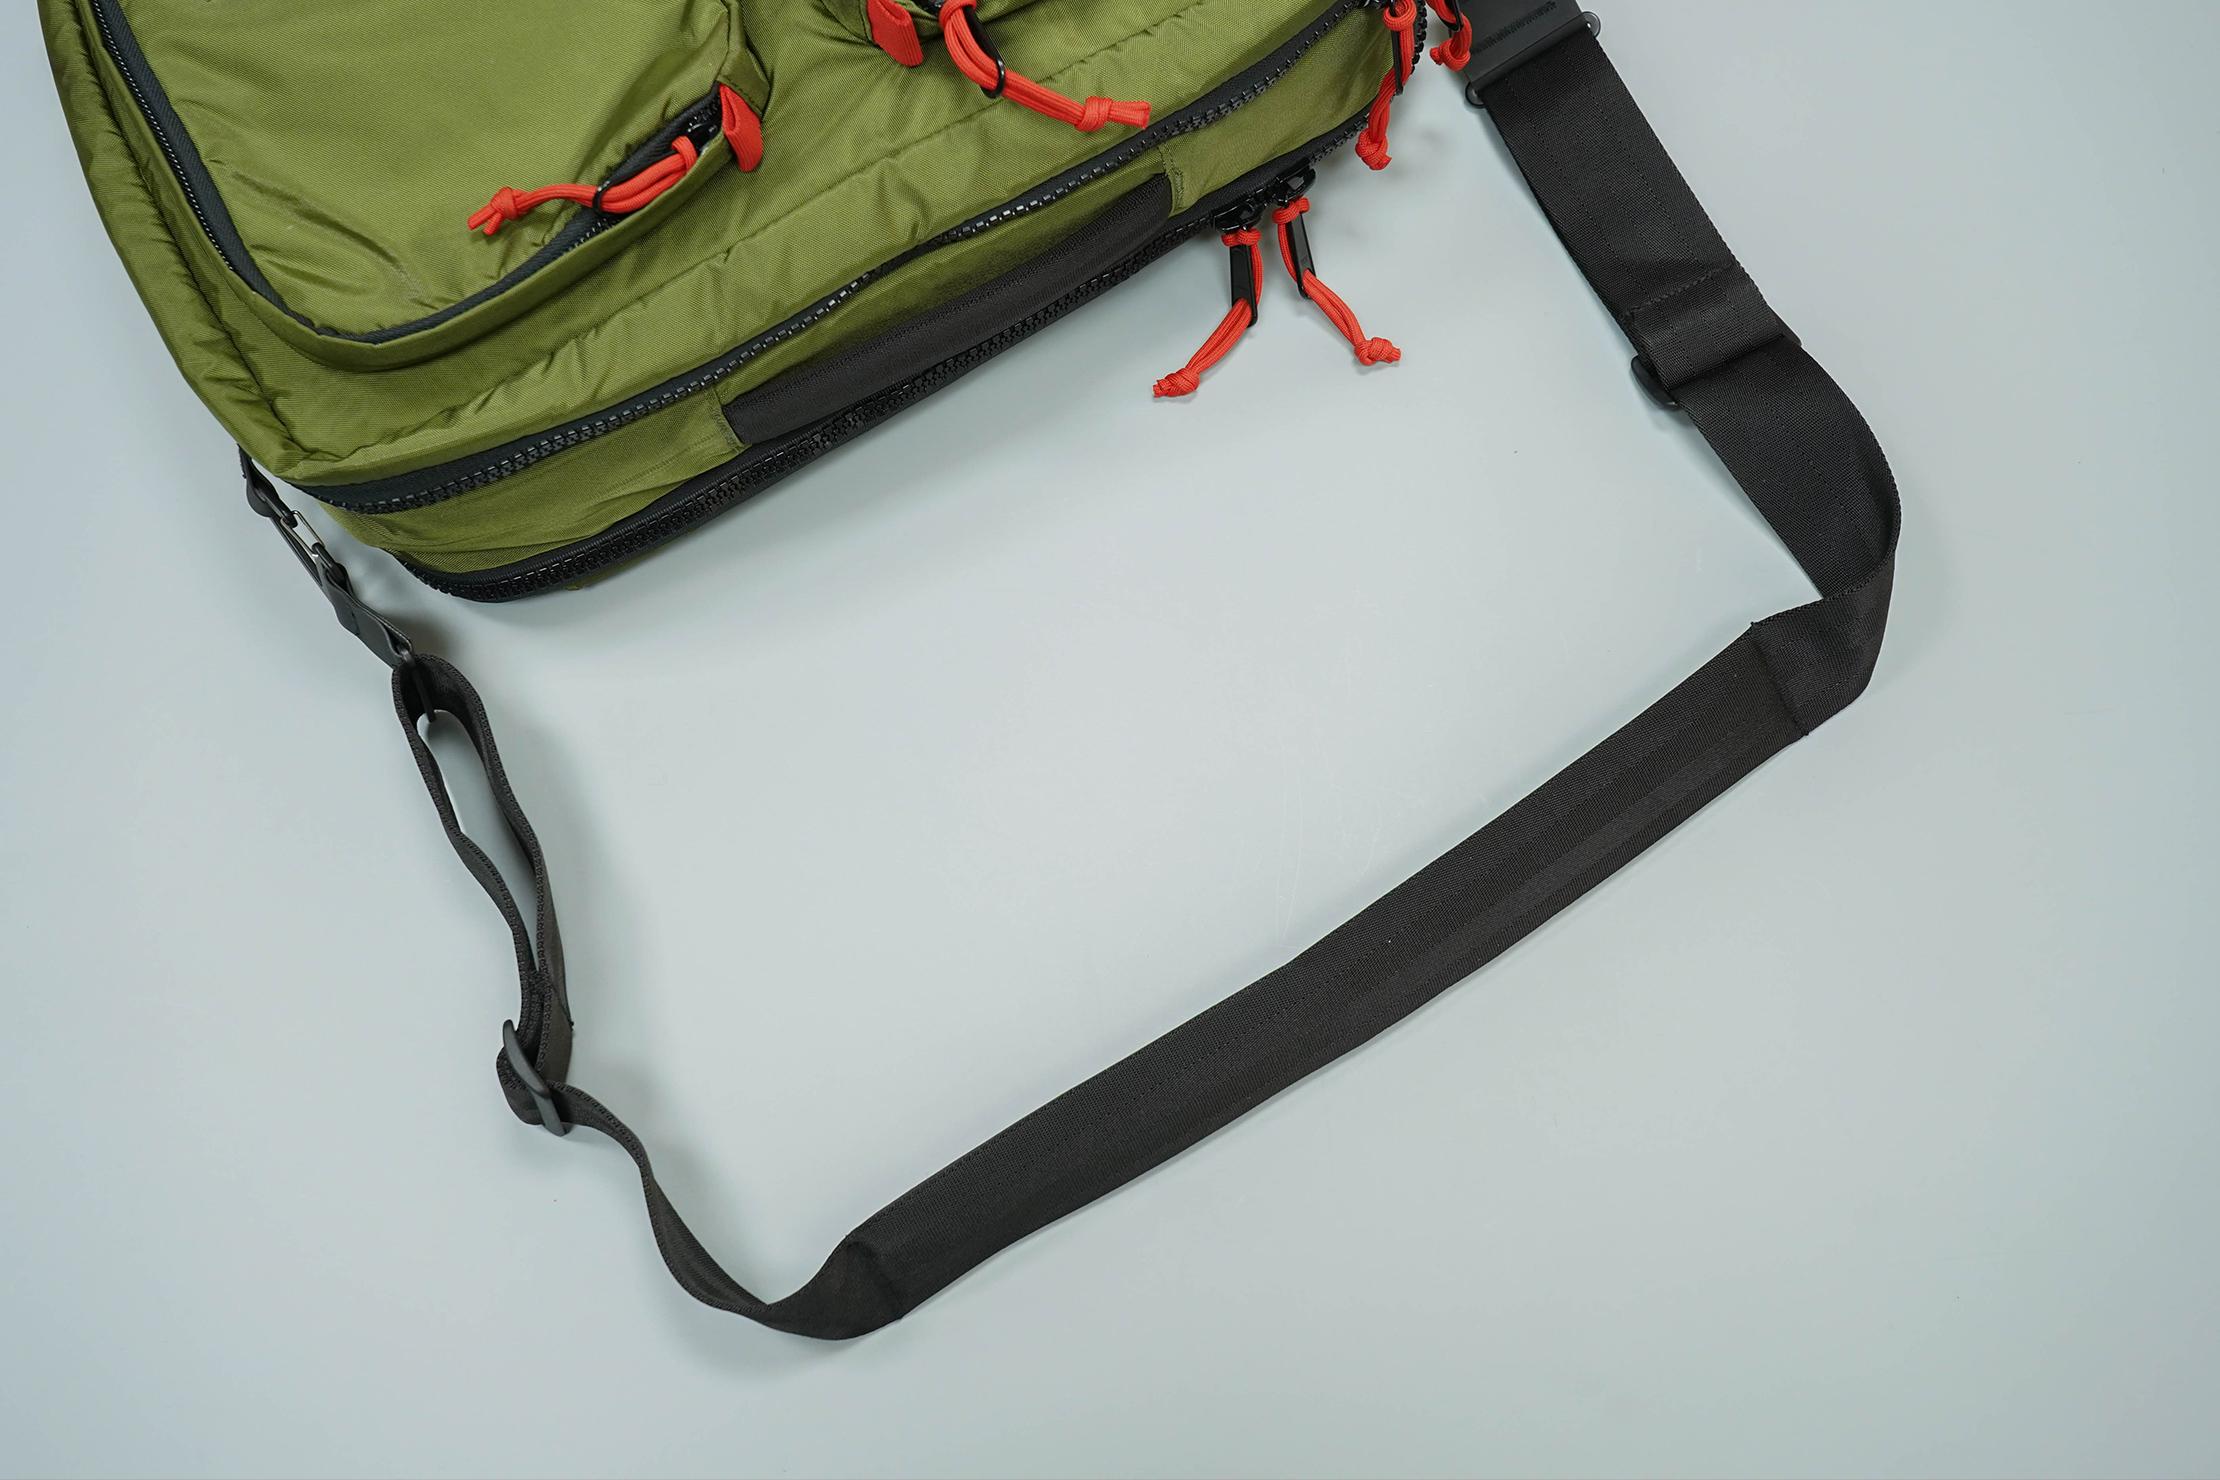 Topo Designs Global Briefcase 3-Day Messenger Strap